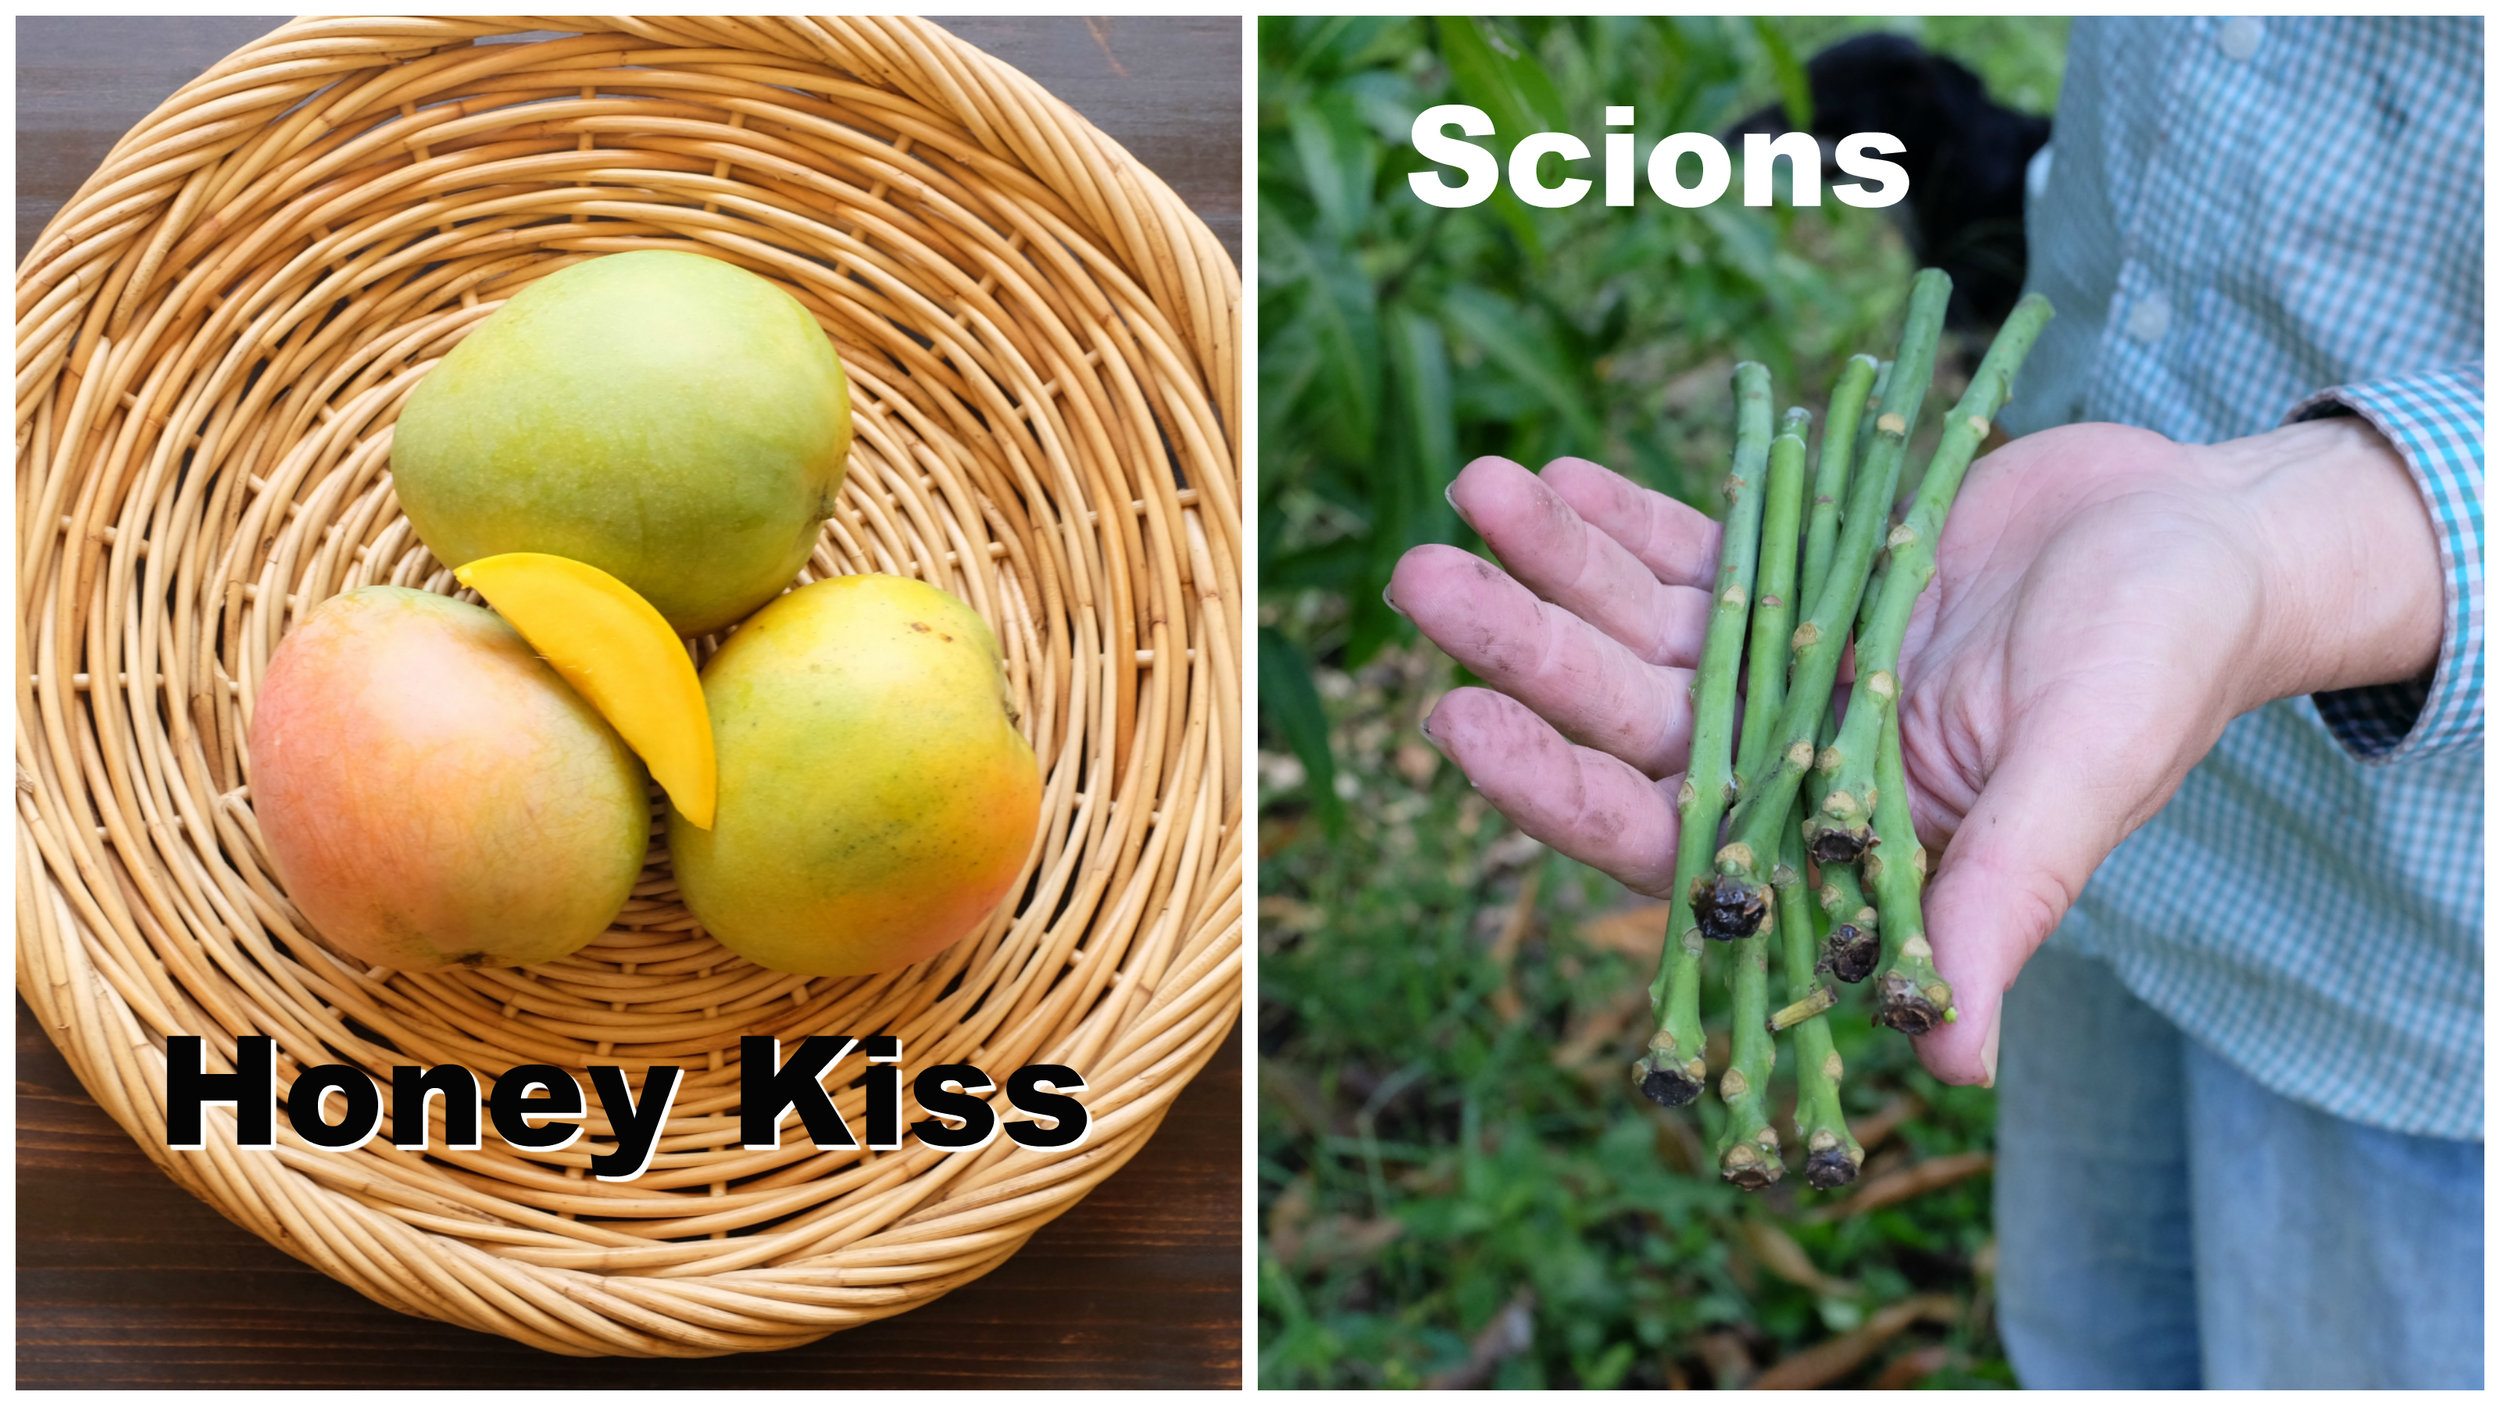 honey kiss scions.jpg